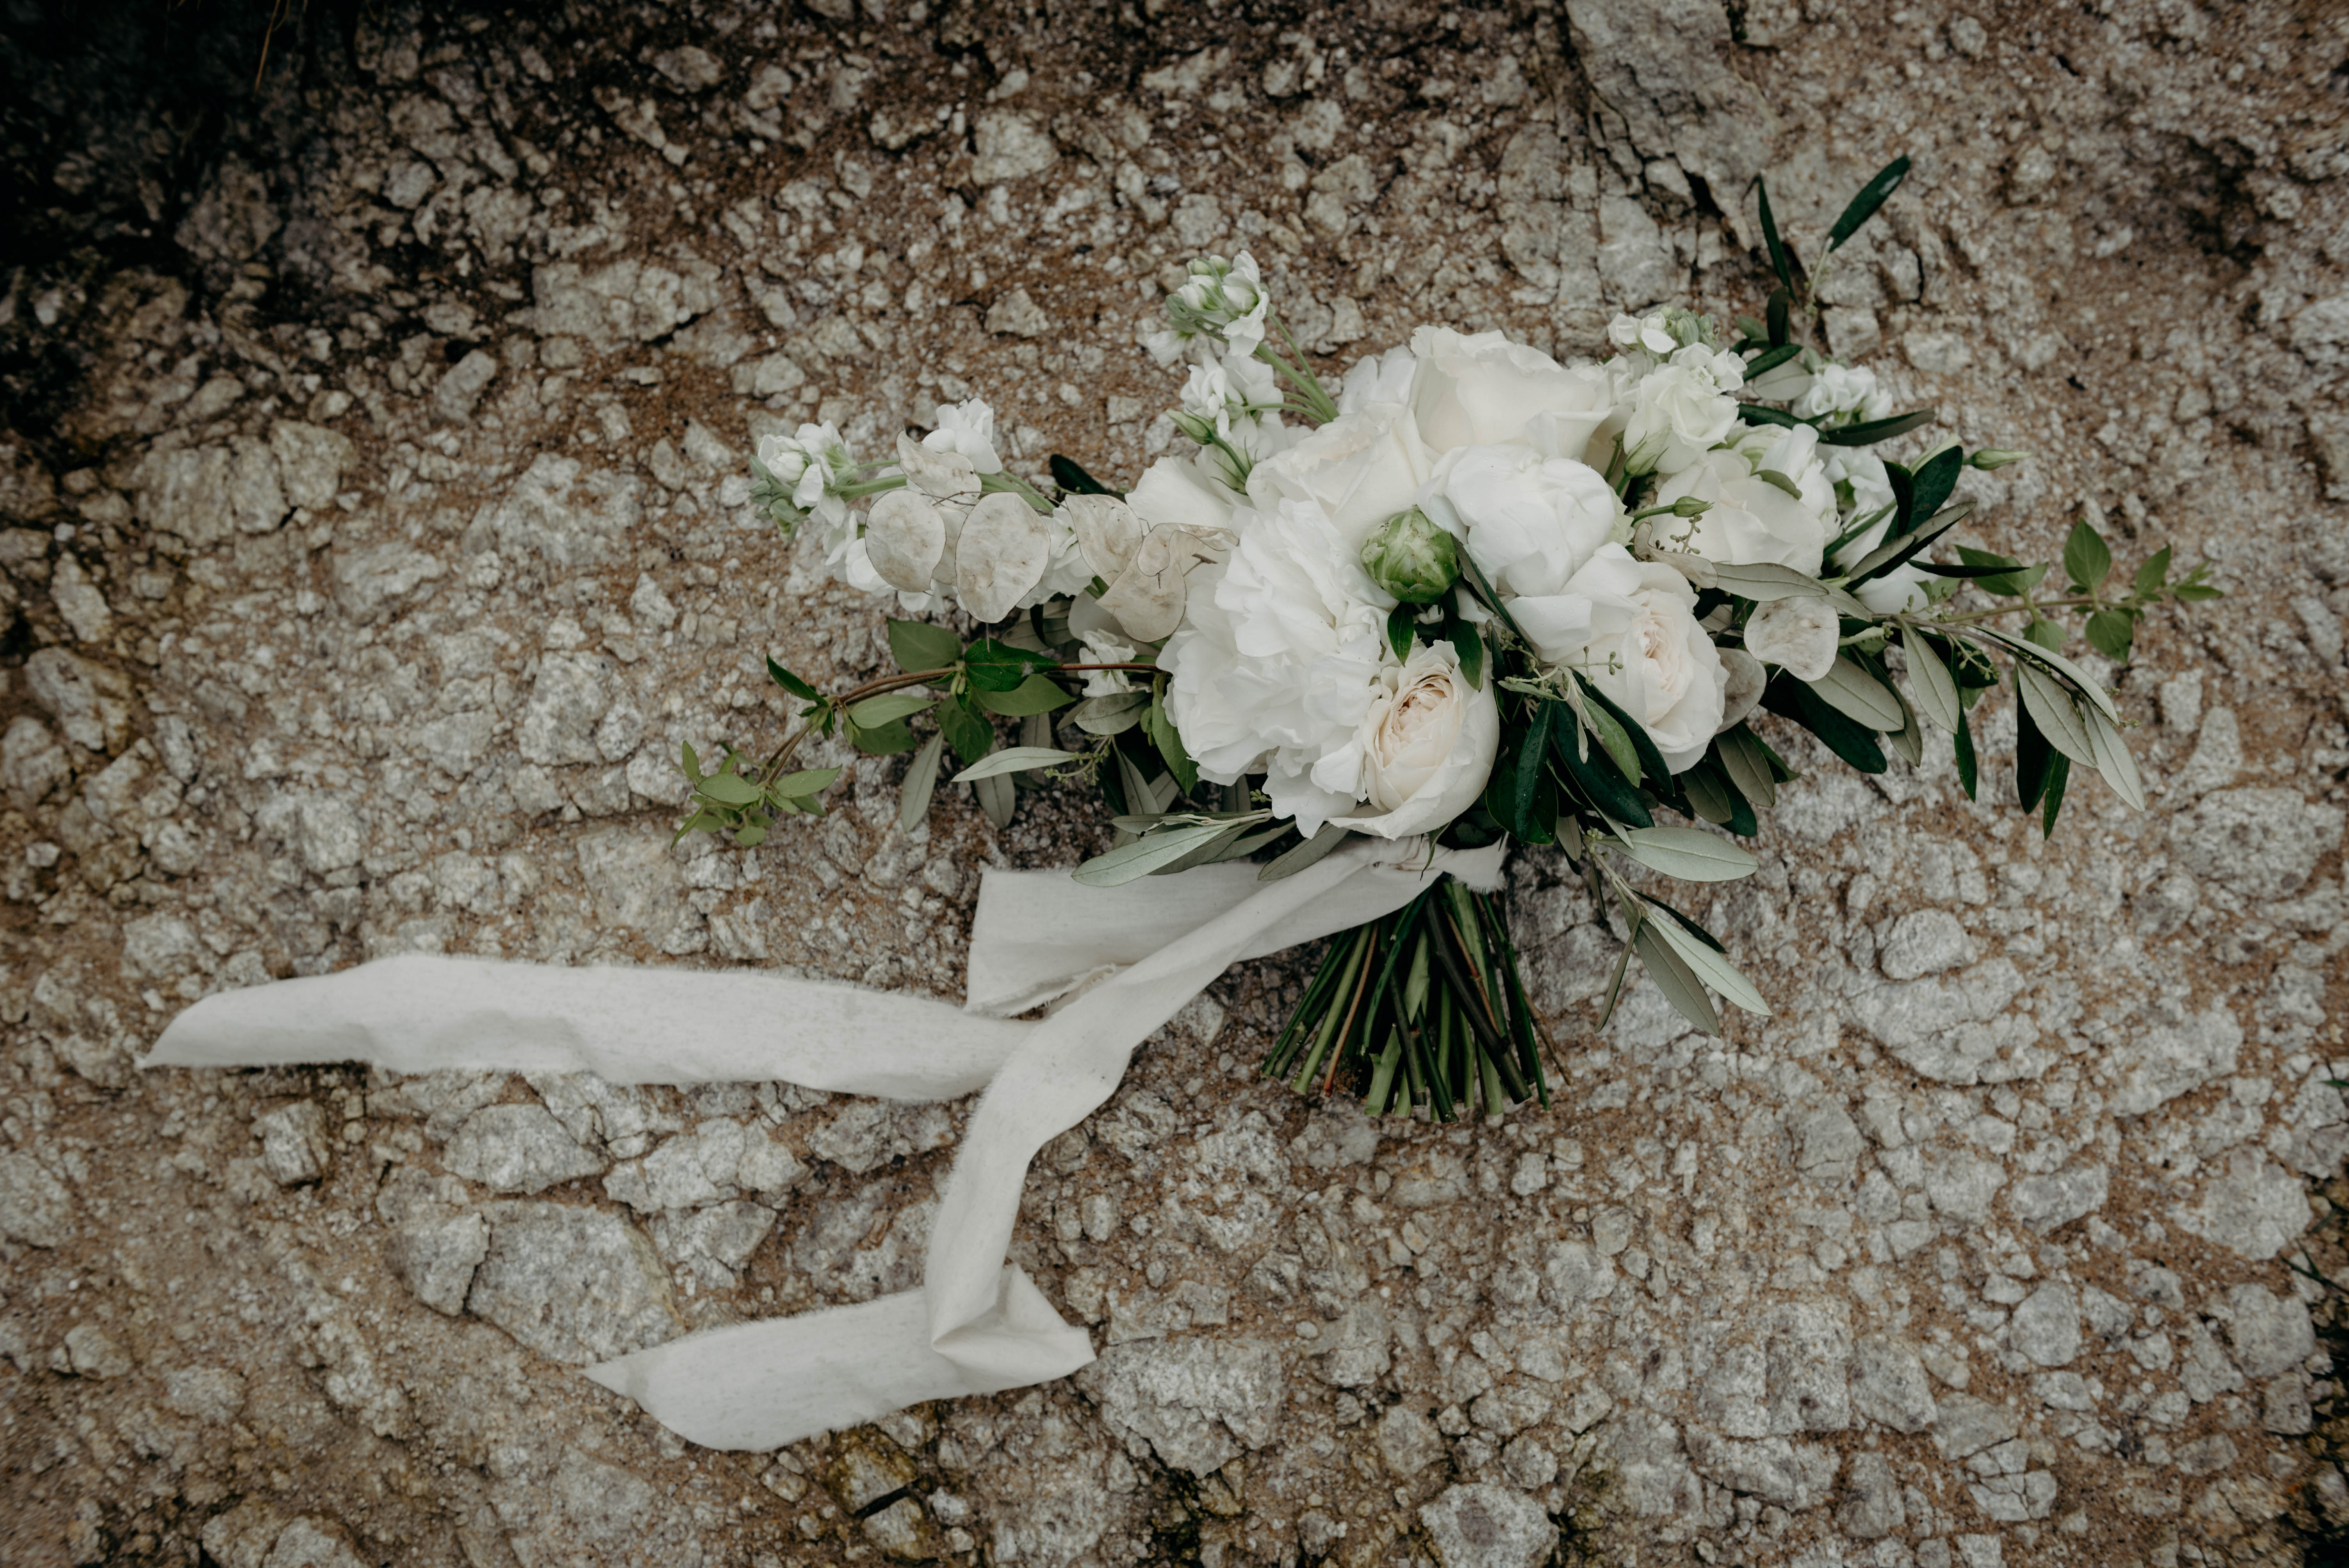 Folie Douce - Artisan Fleuriste - La mariée aux pieds nus